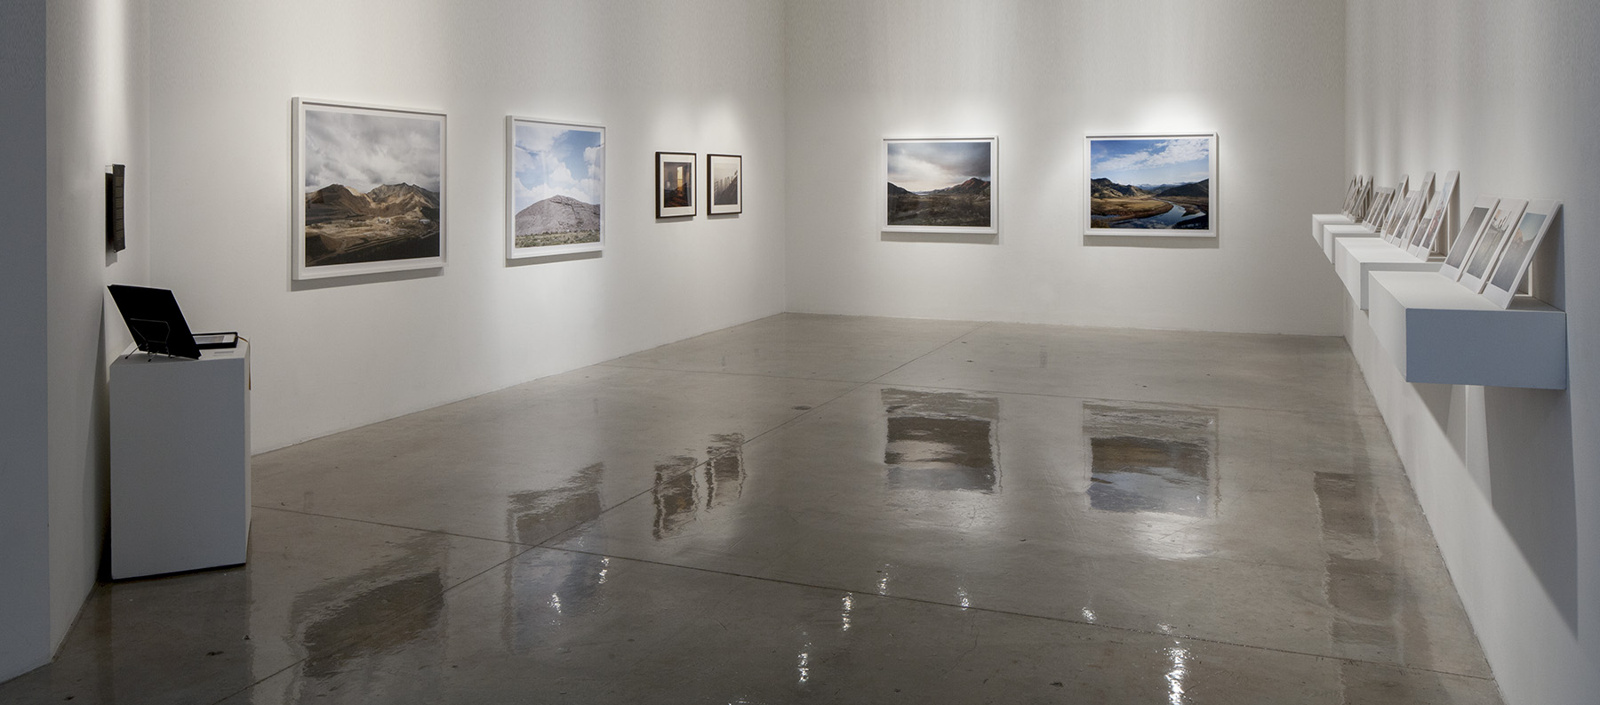 Lionel Rombach Gallery Tucson, Arizona (2015)